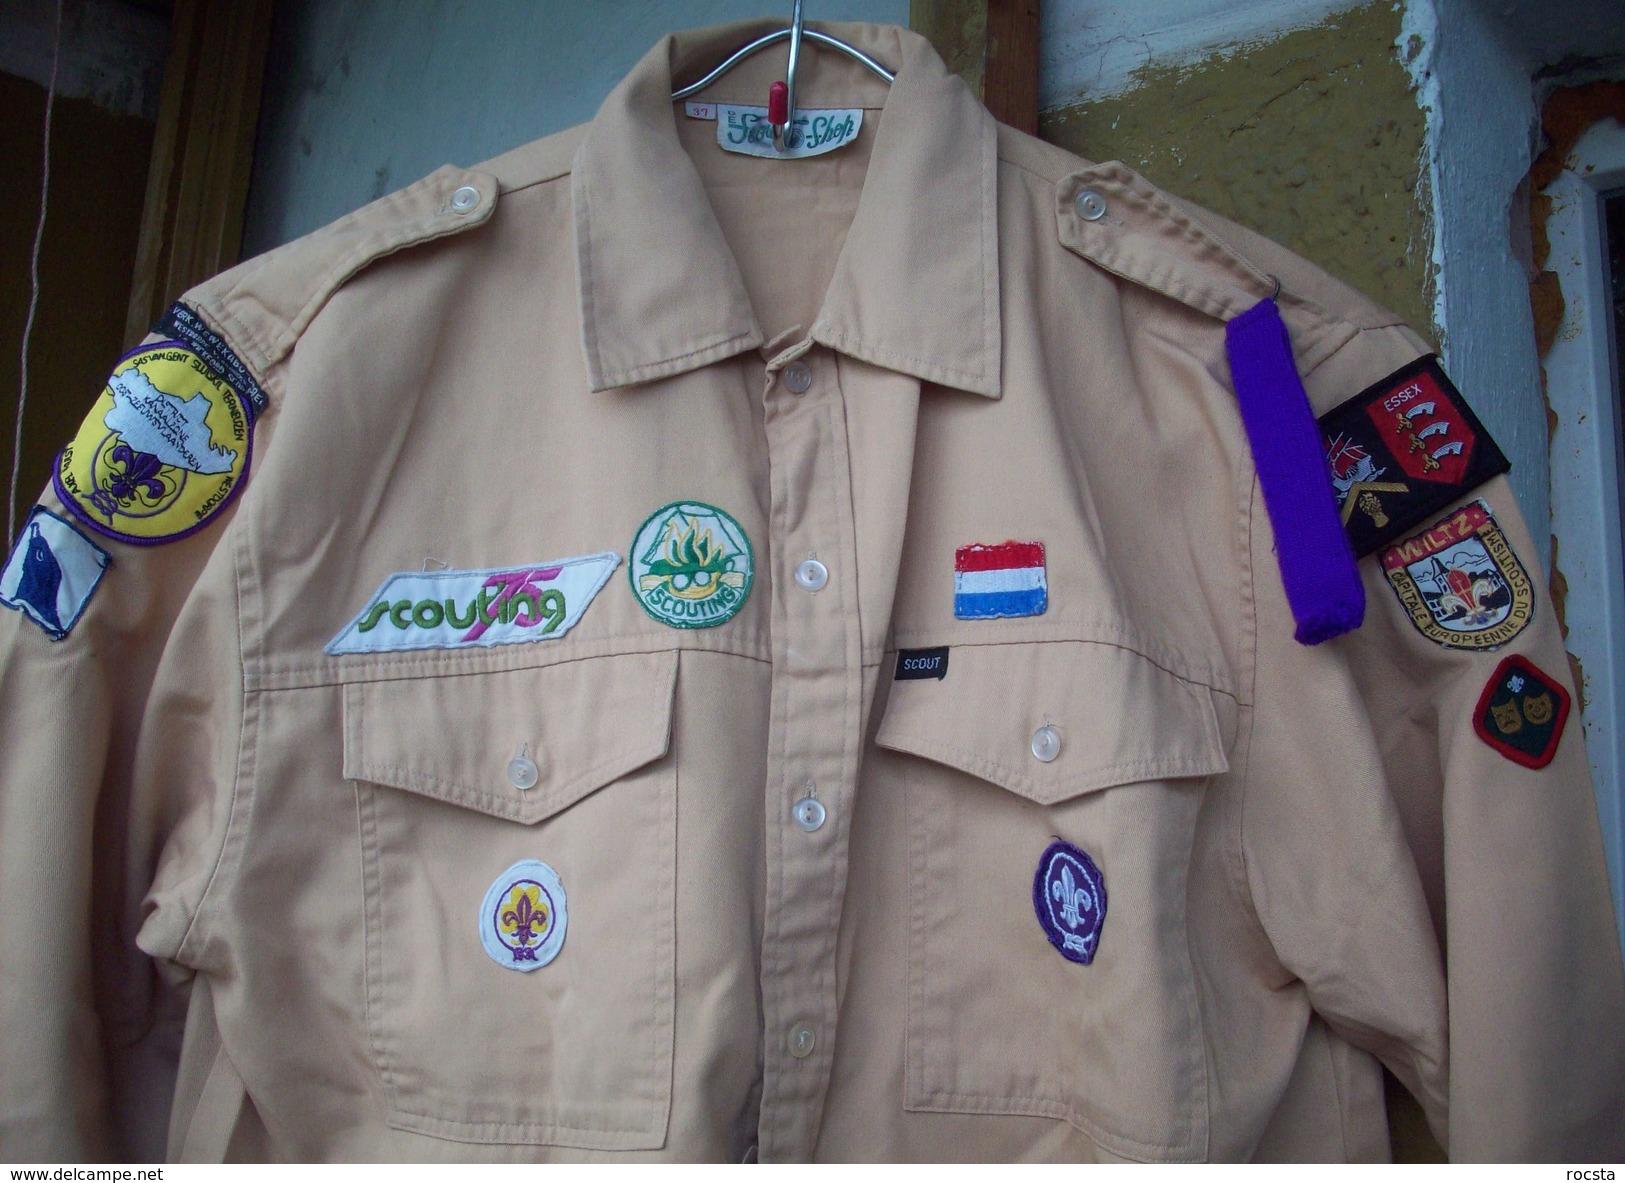 Netherlands Scout Shirt - 12 Patches & Ranks - Padvinderij